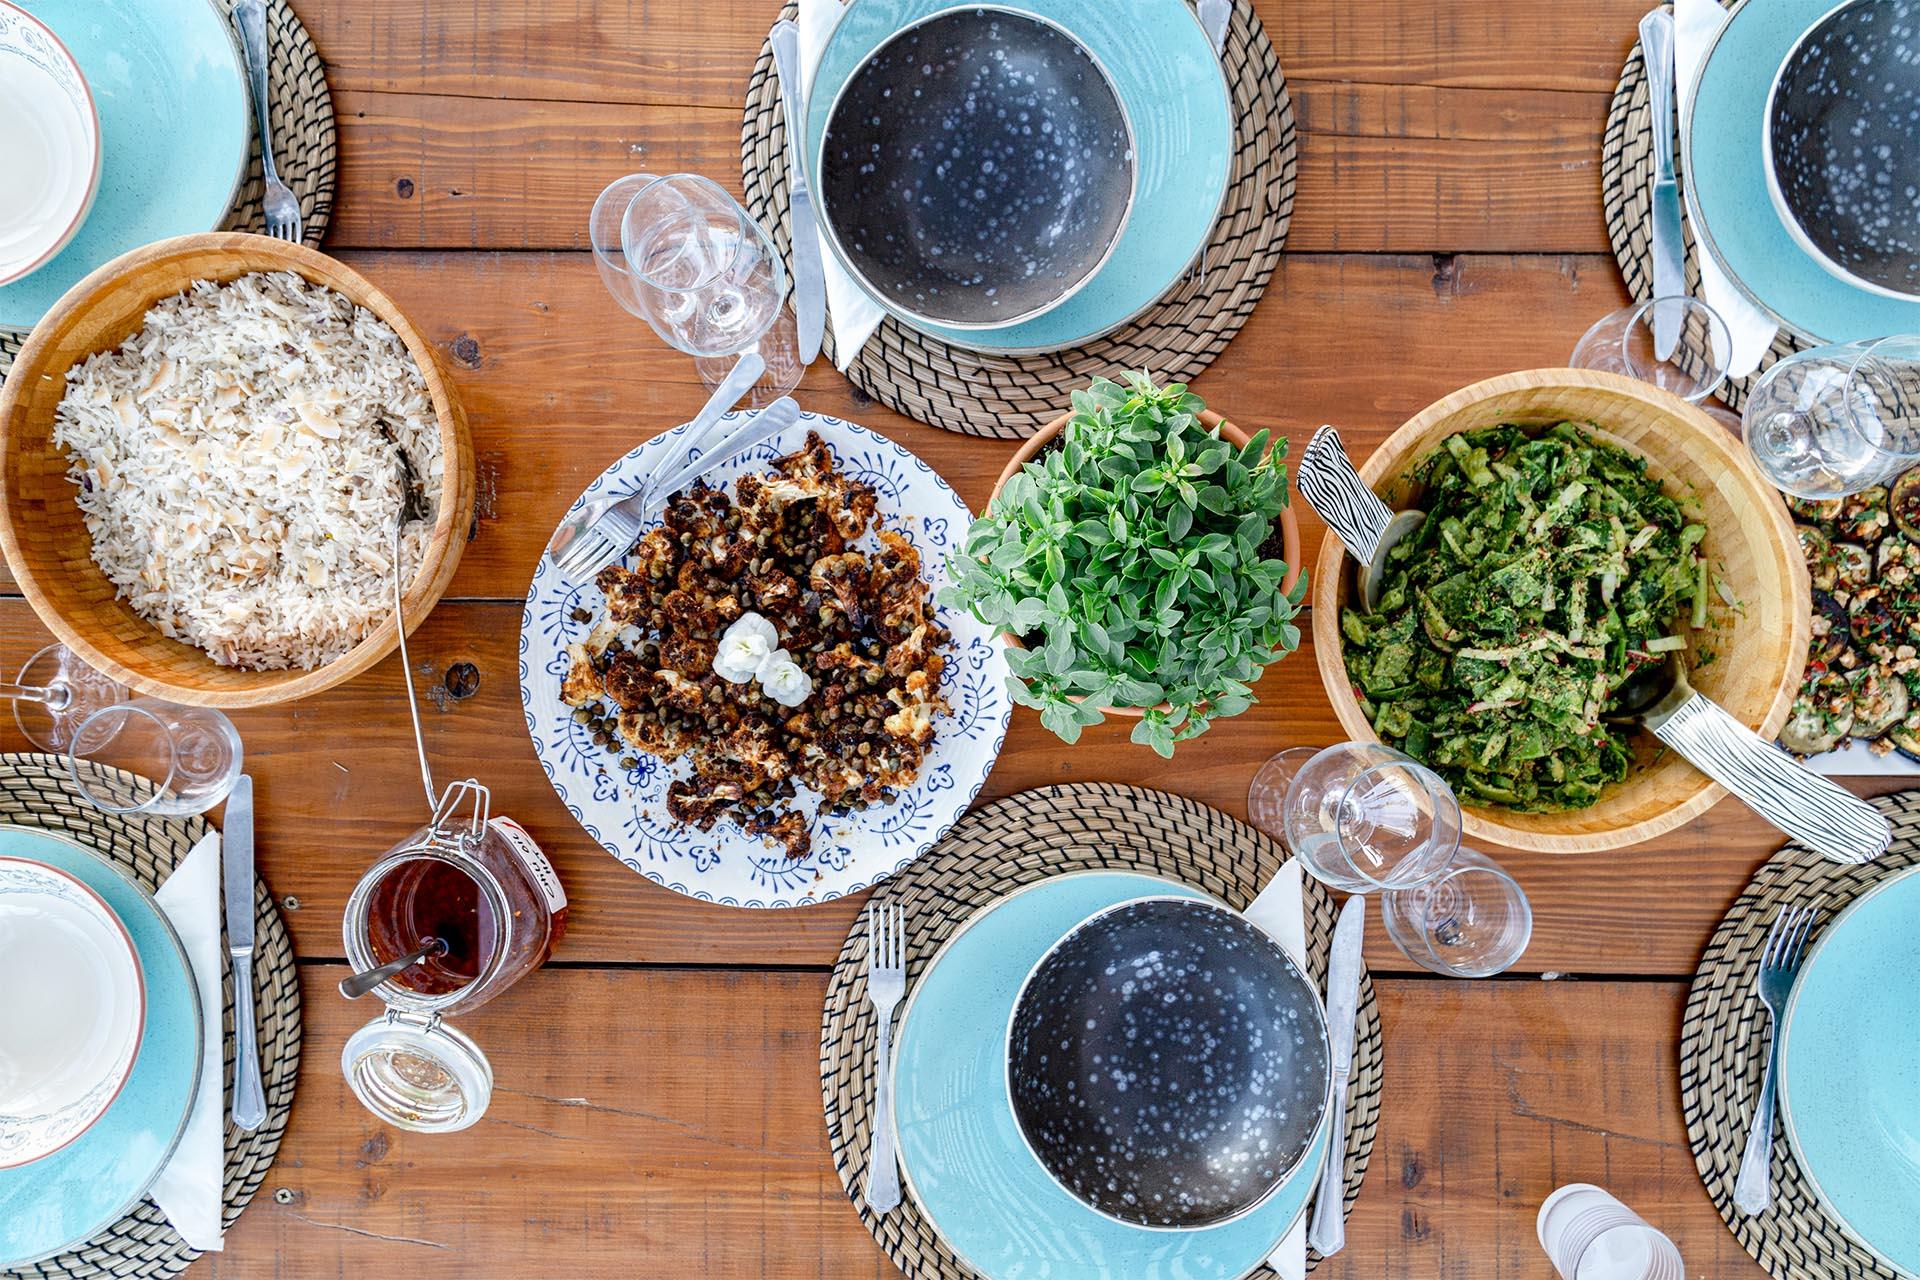 Culinary delights at Pelion Retreat Centre